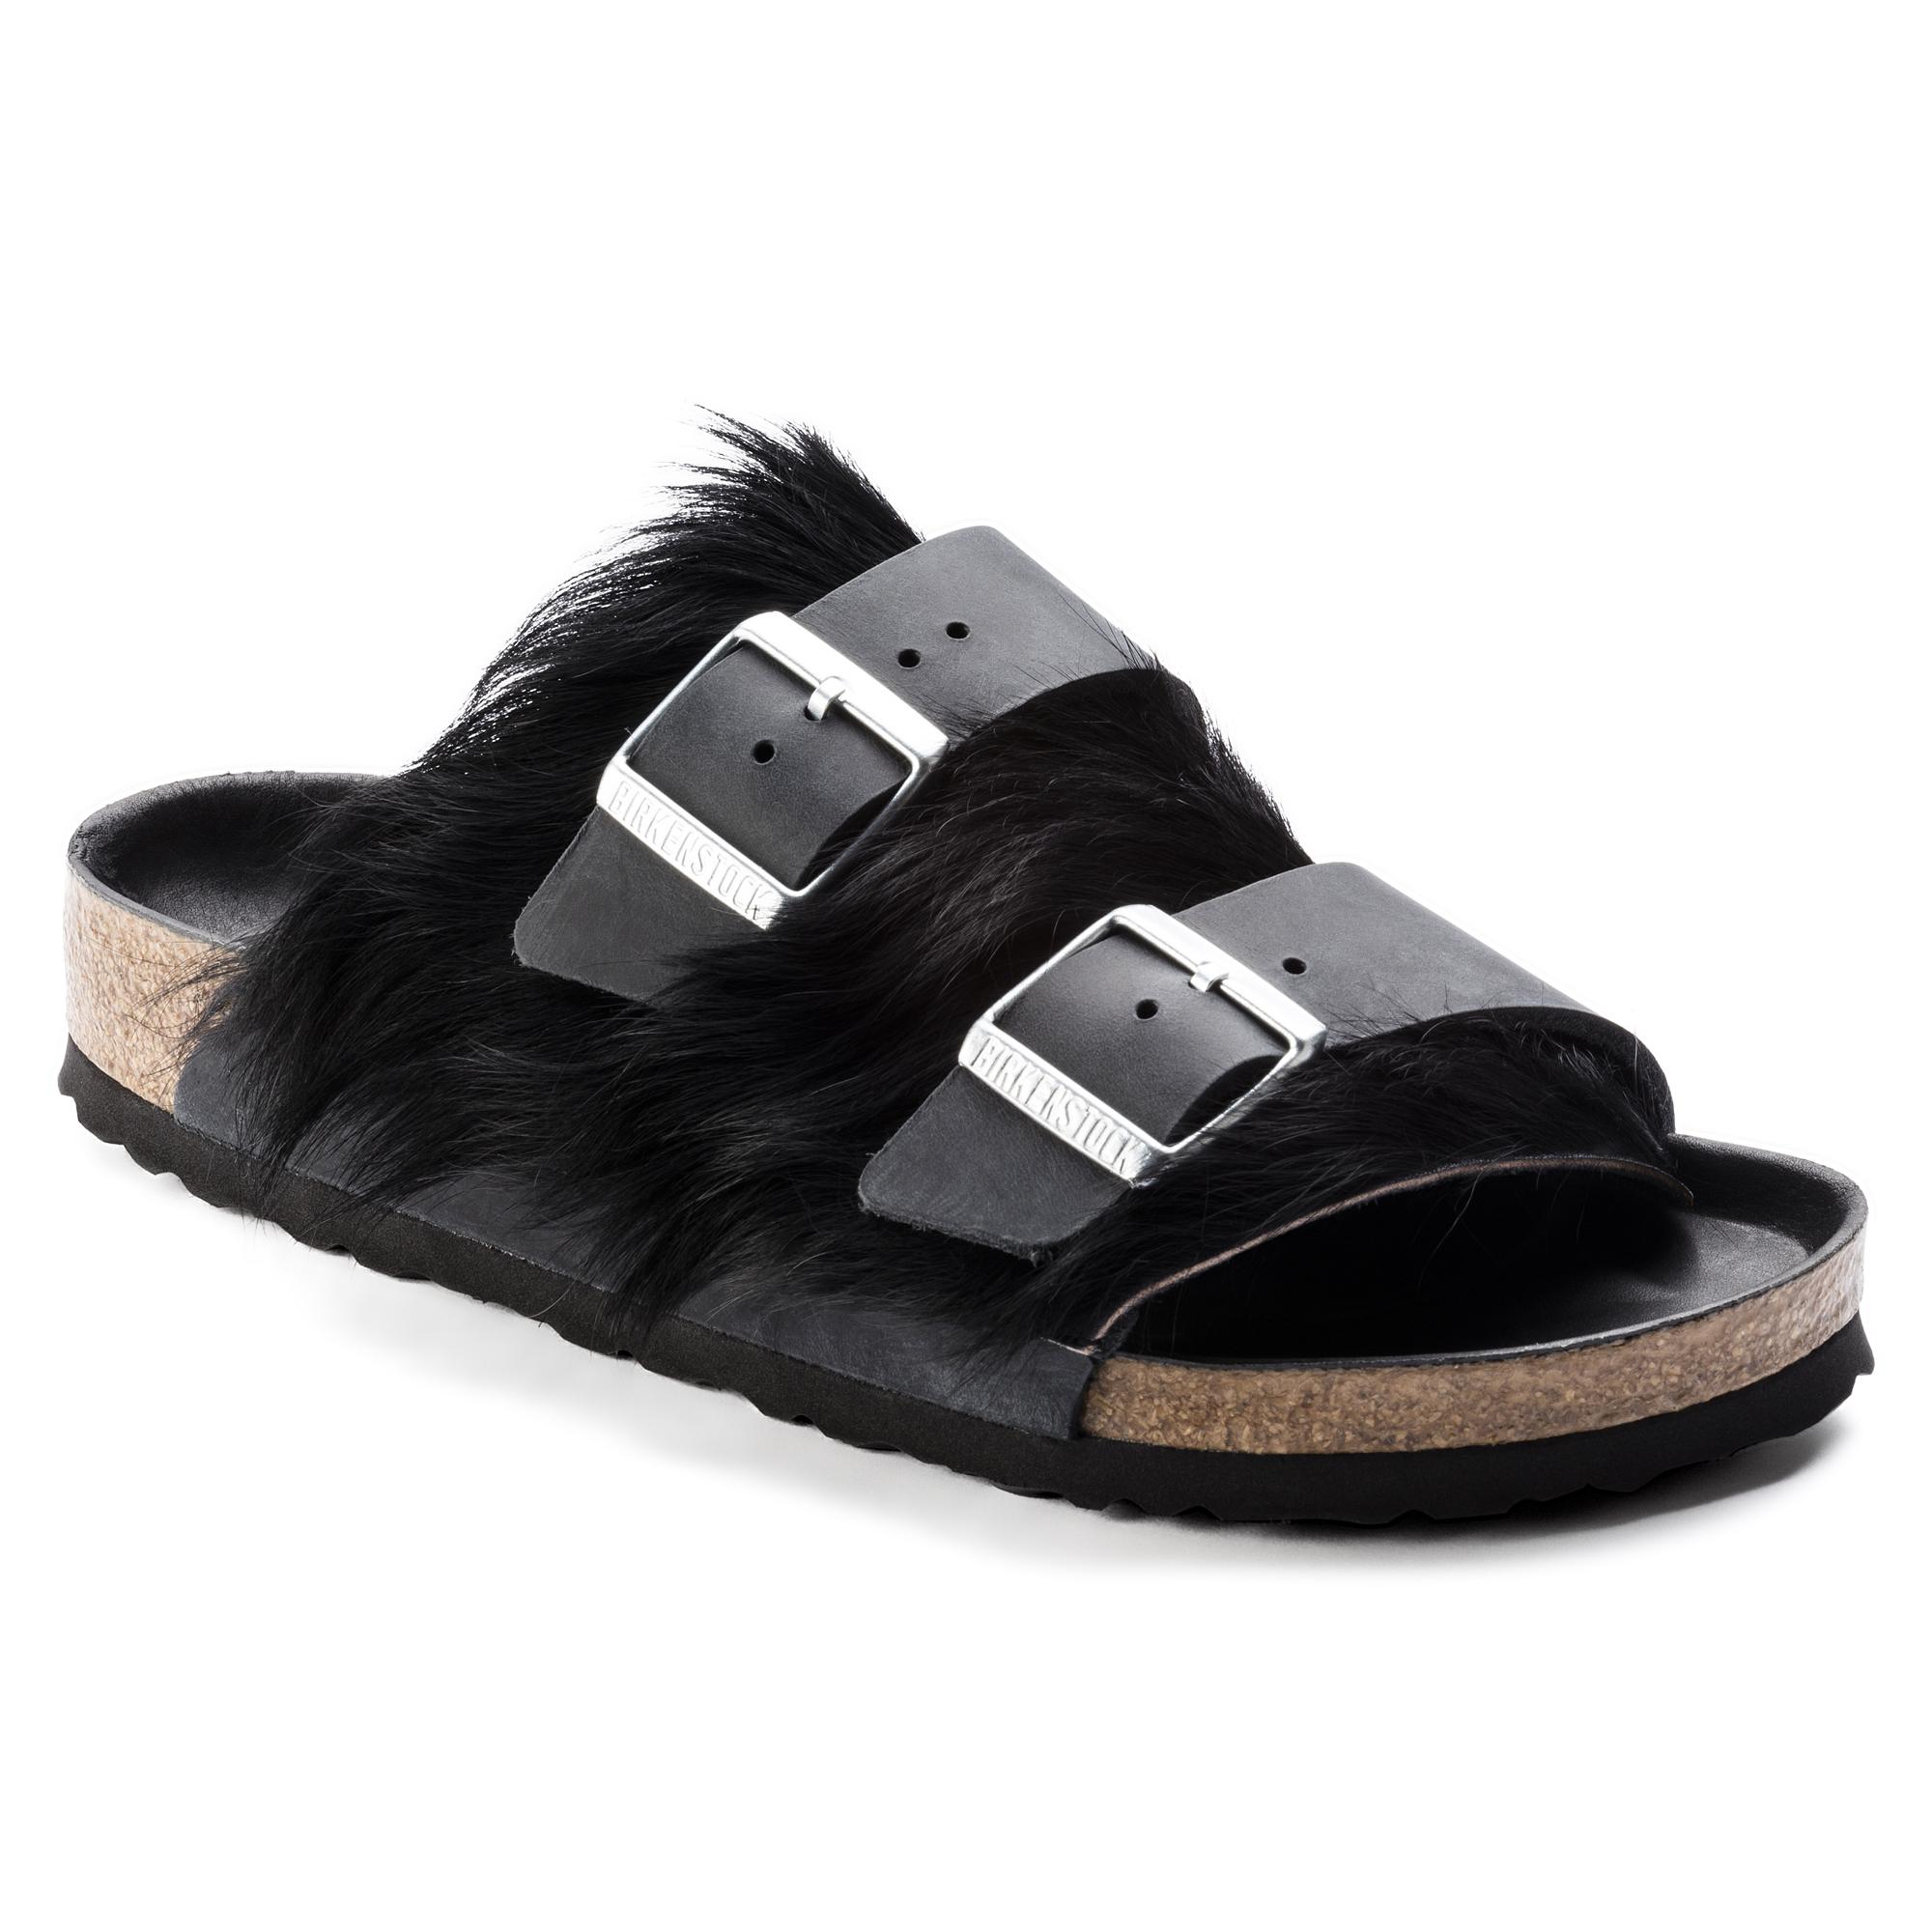 8e368d6a9577 Arizona Natural Leather Fur Black